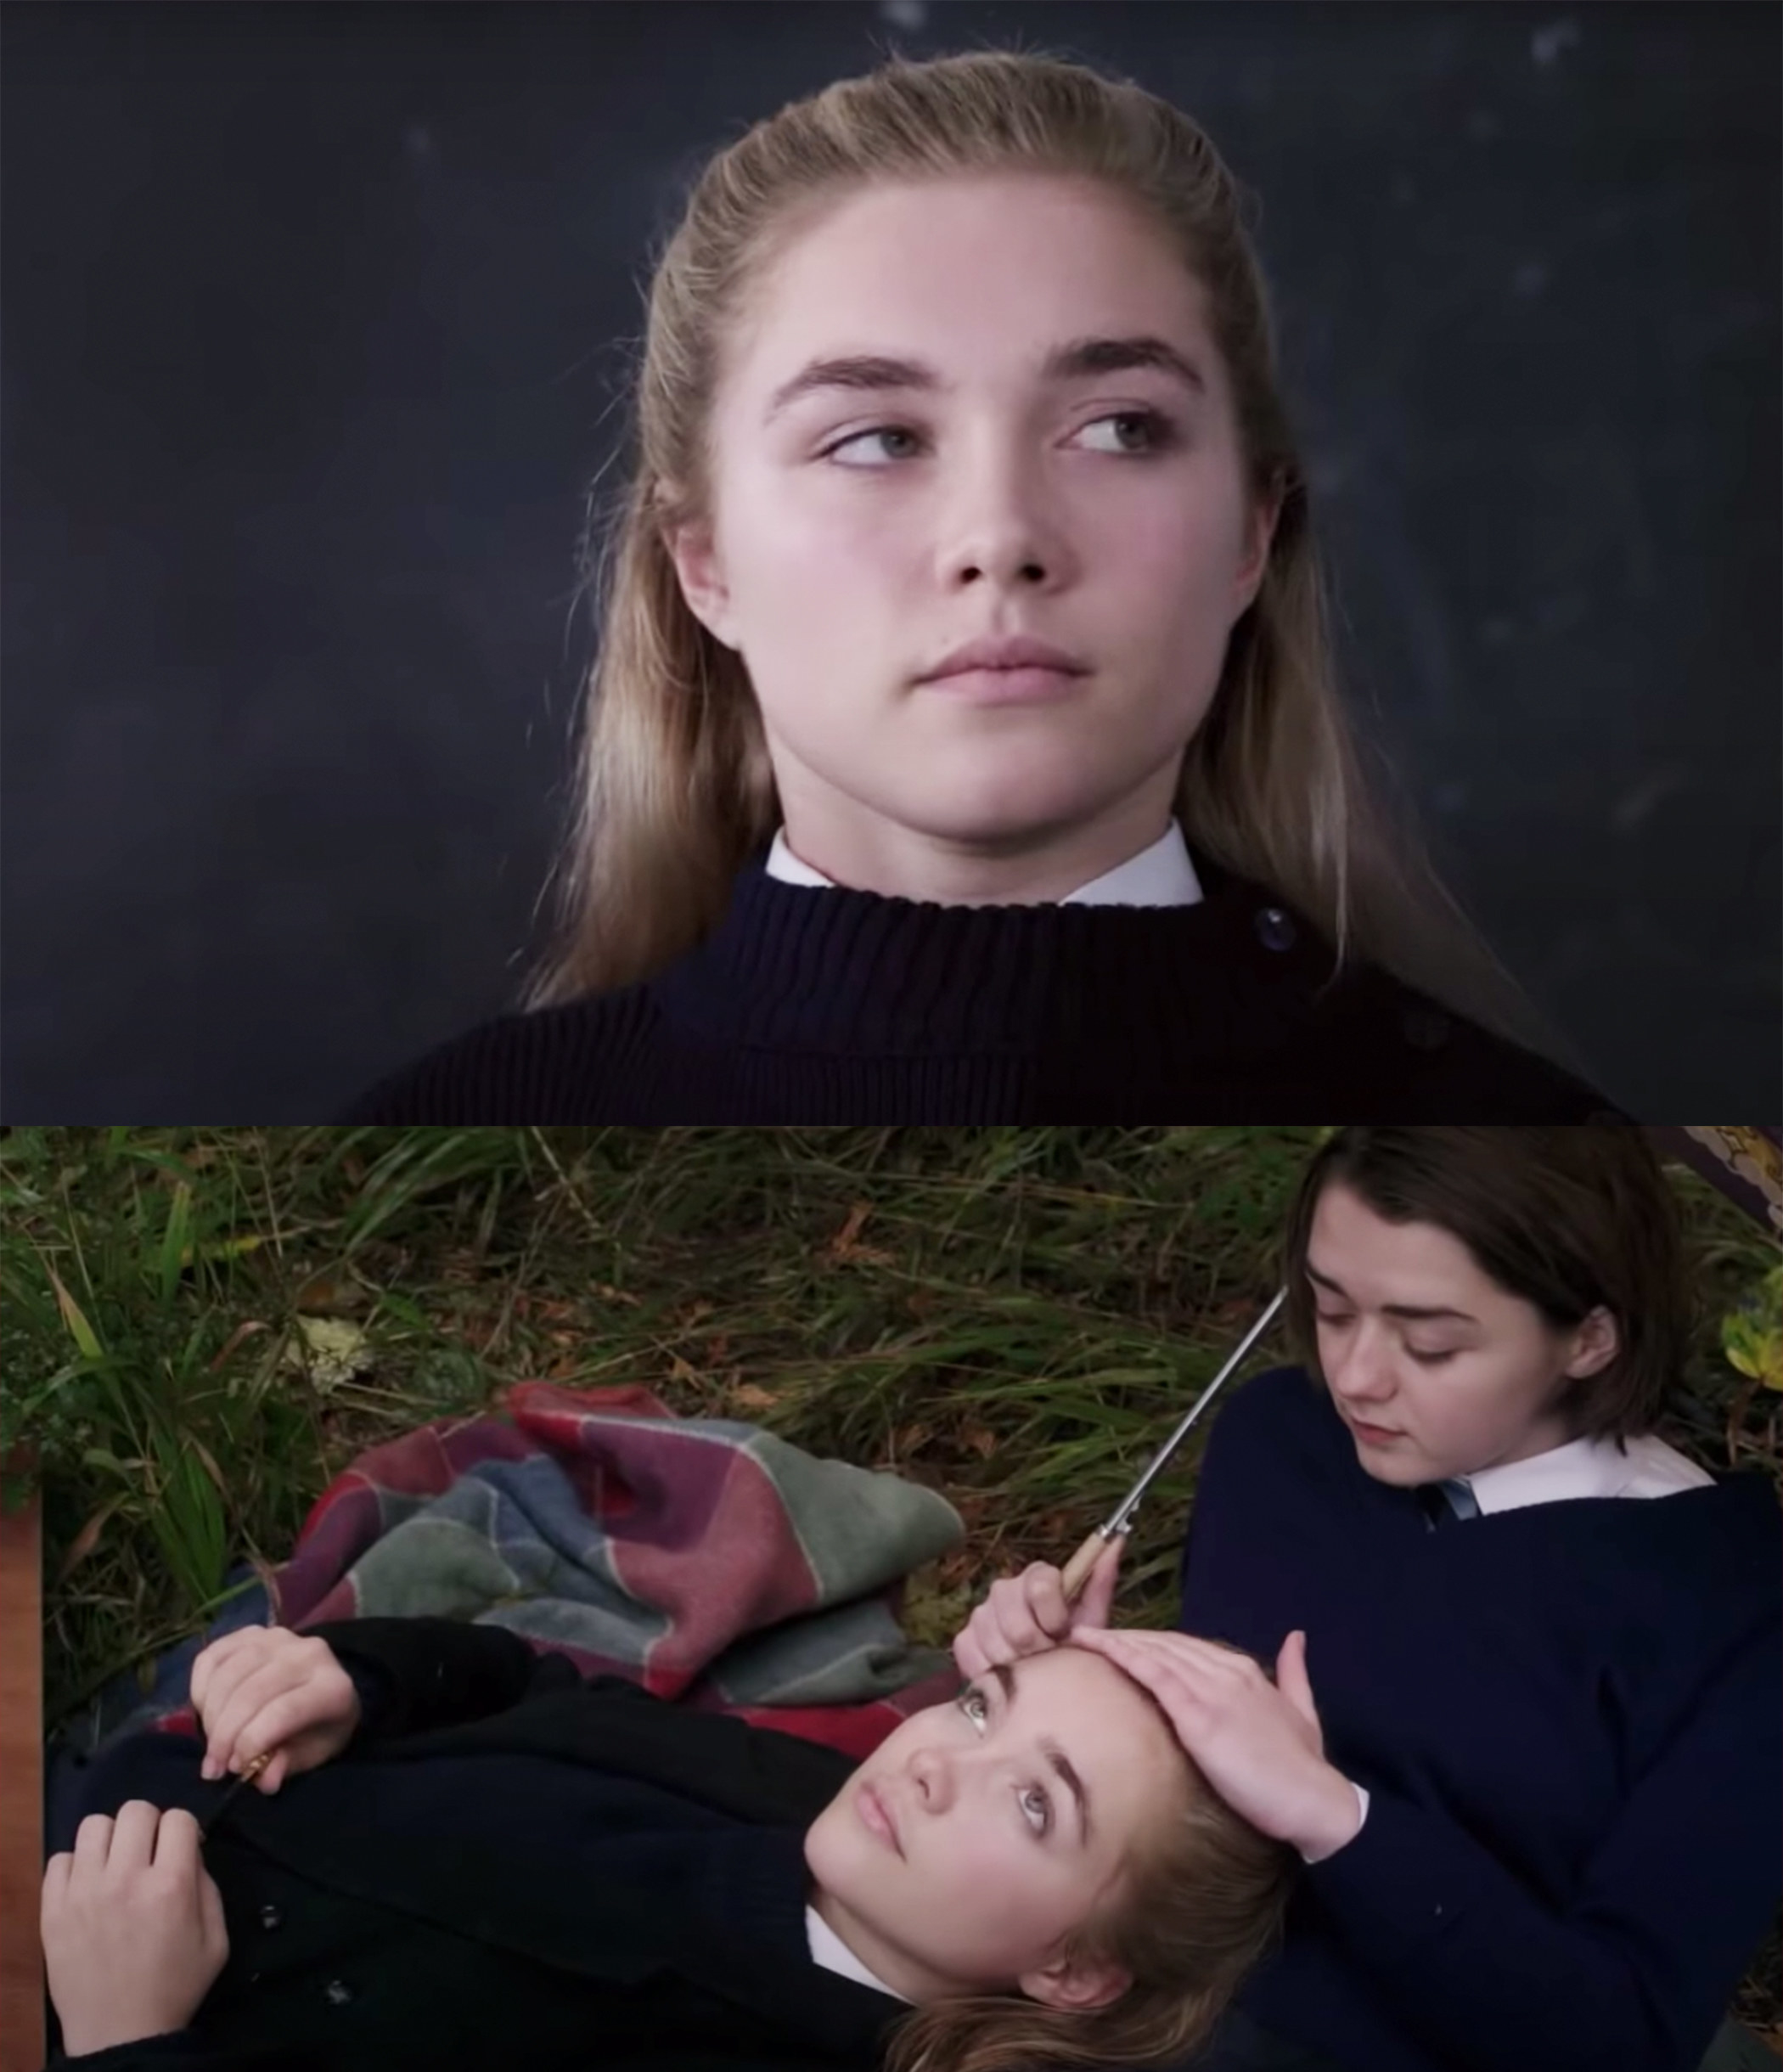 she played a schoolgirl alongside Maisie Williams